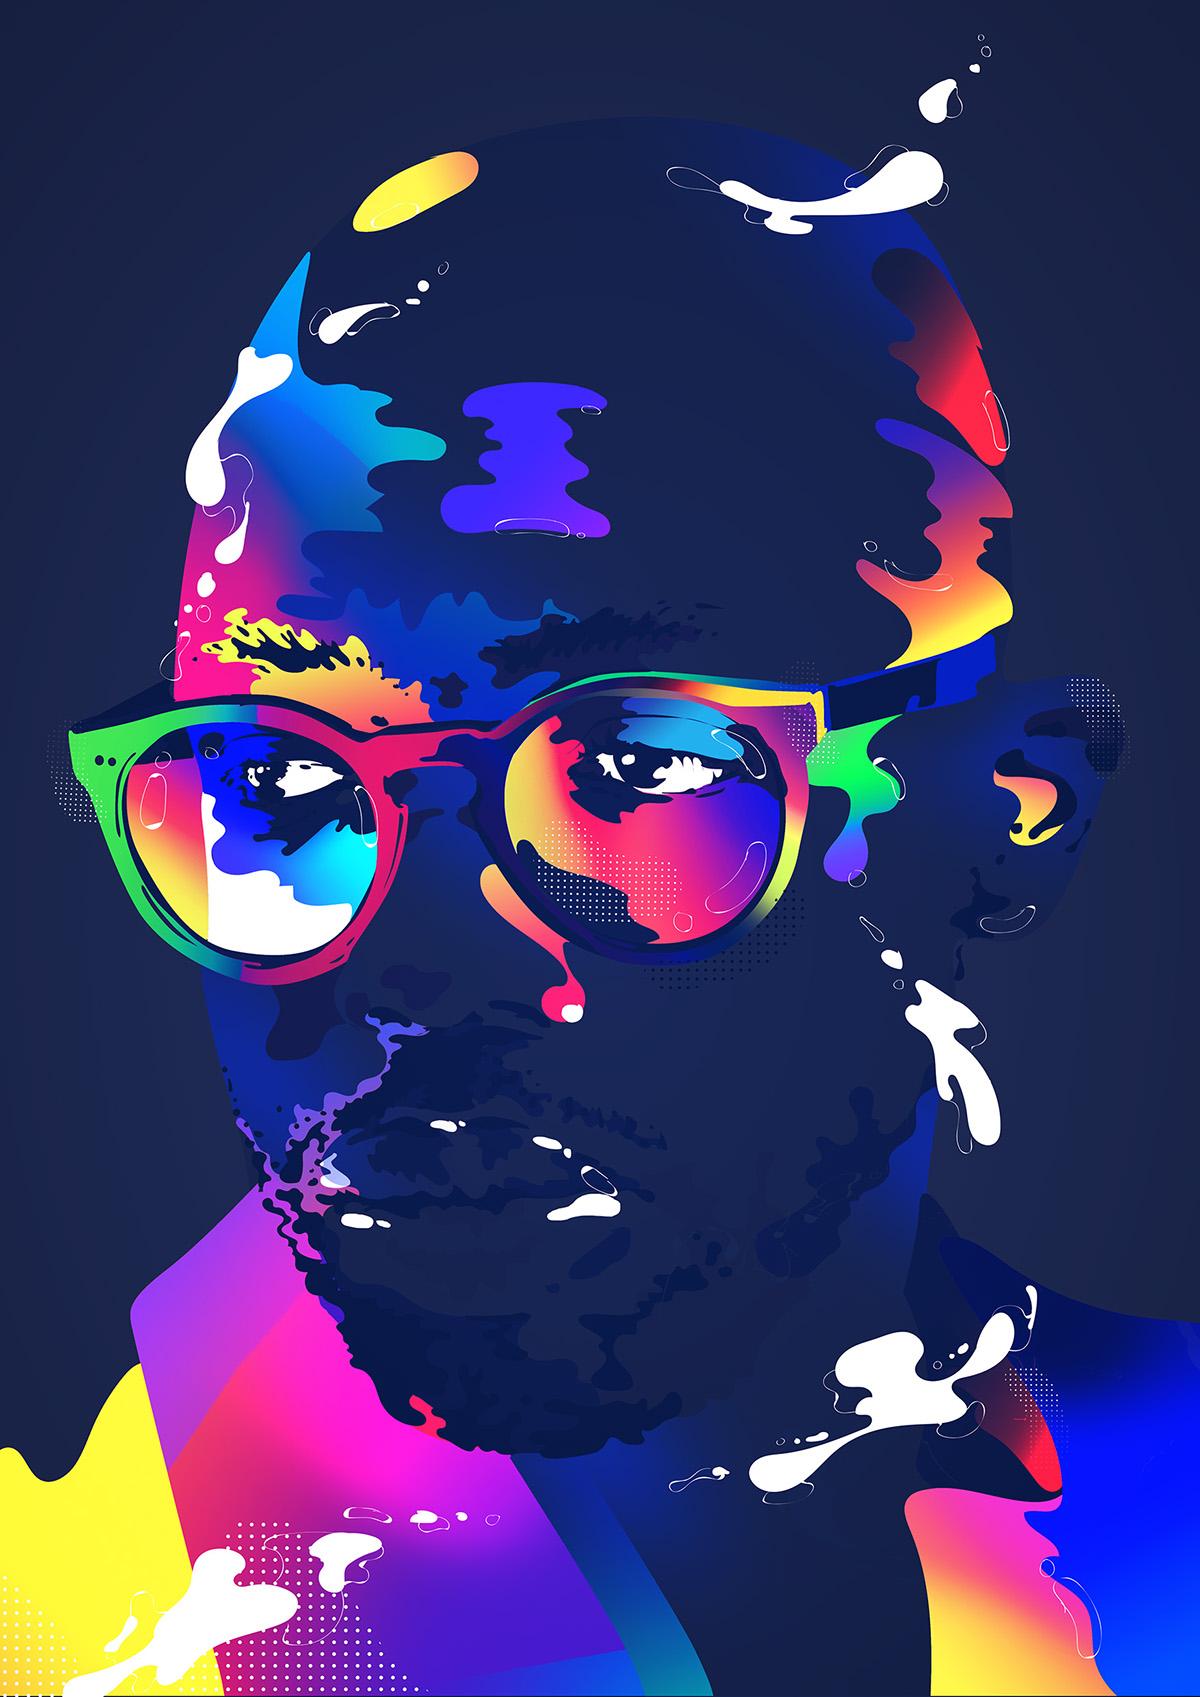 musician color pantone miguel Stromae adobe adobemax portrait magazine dj Singer spotify playlist Illustrator photoshop